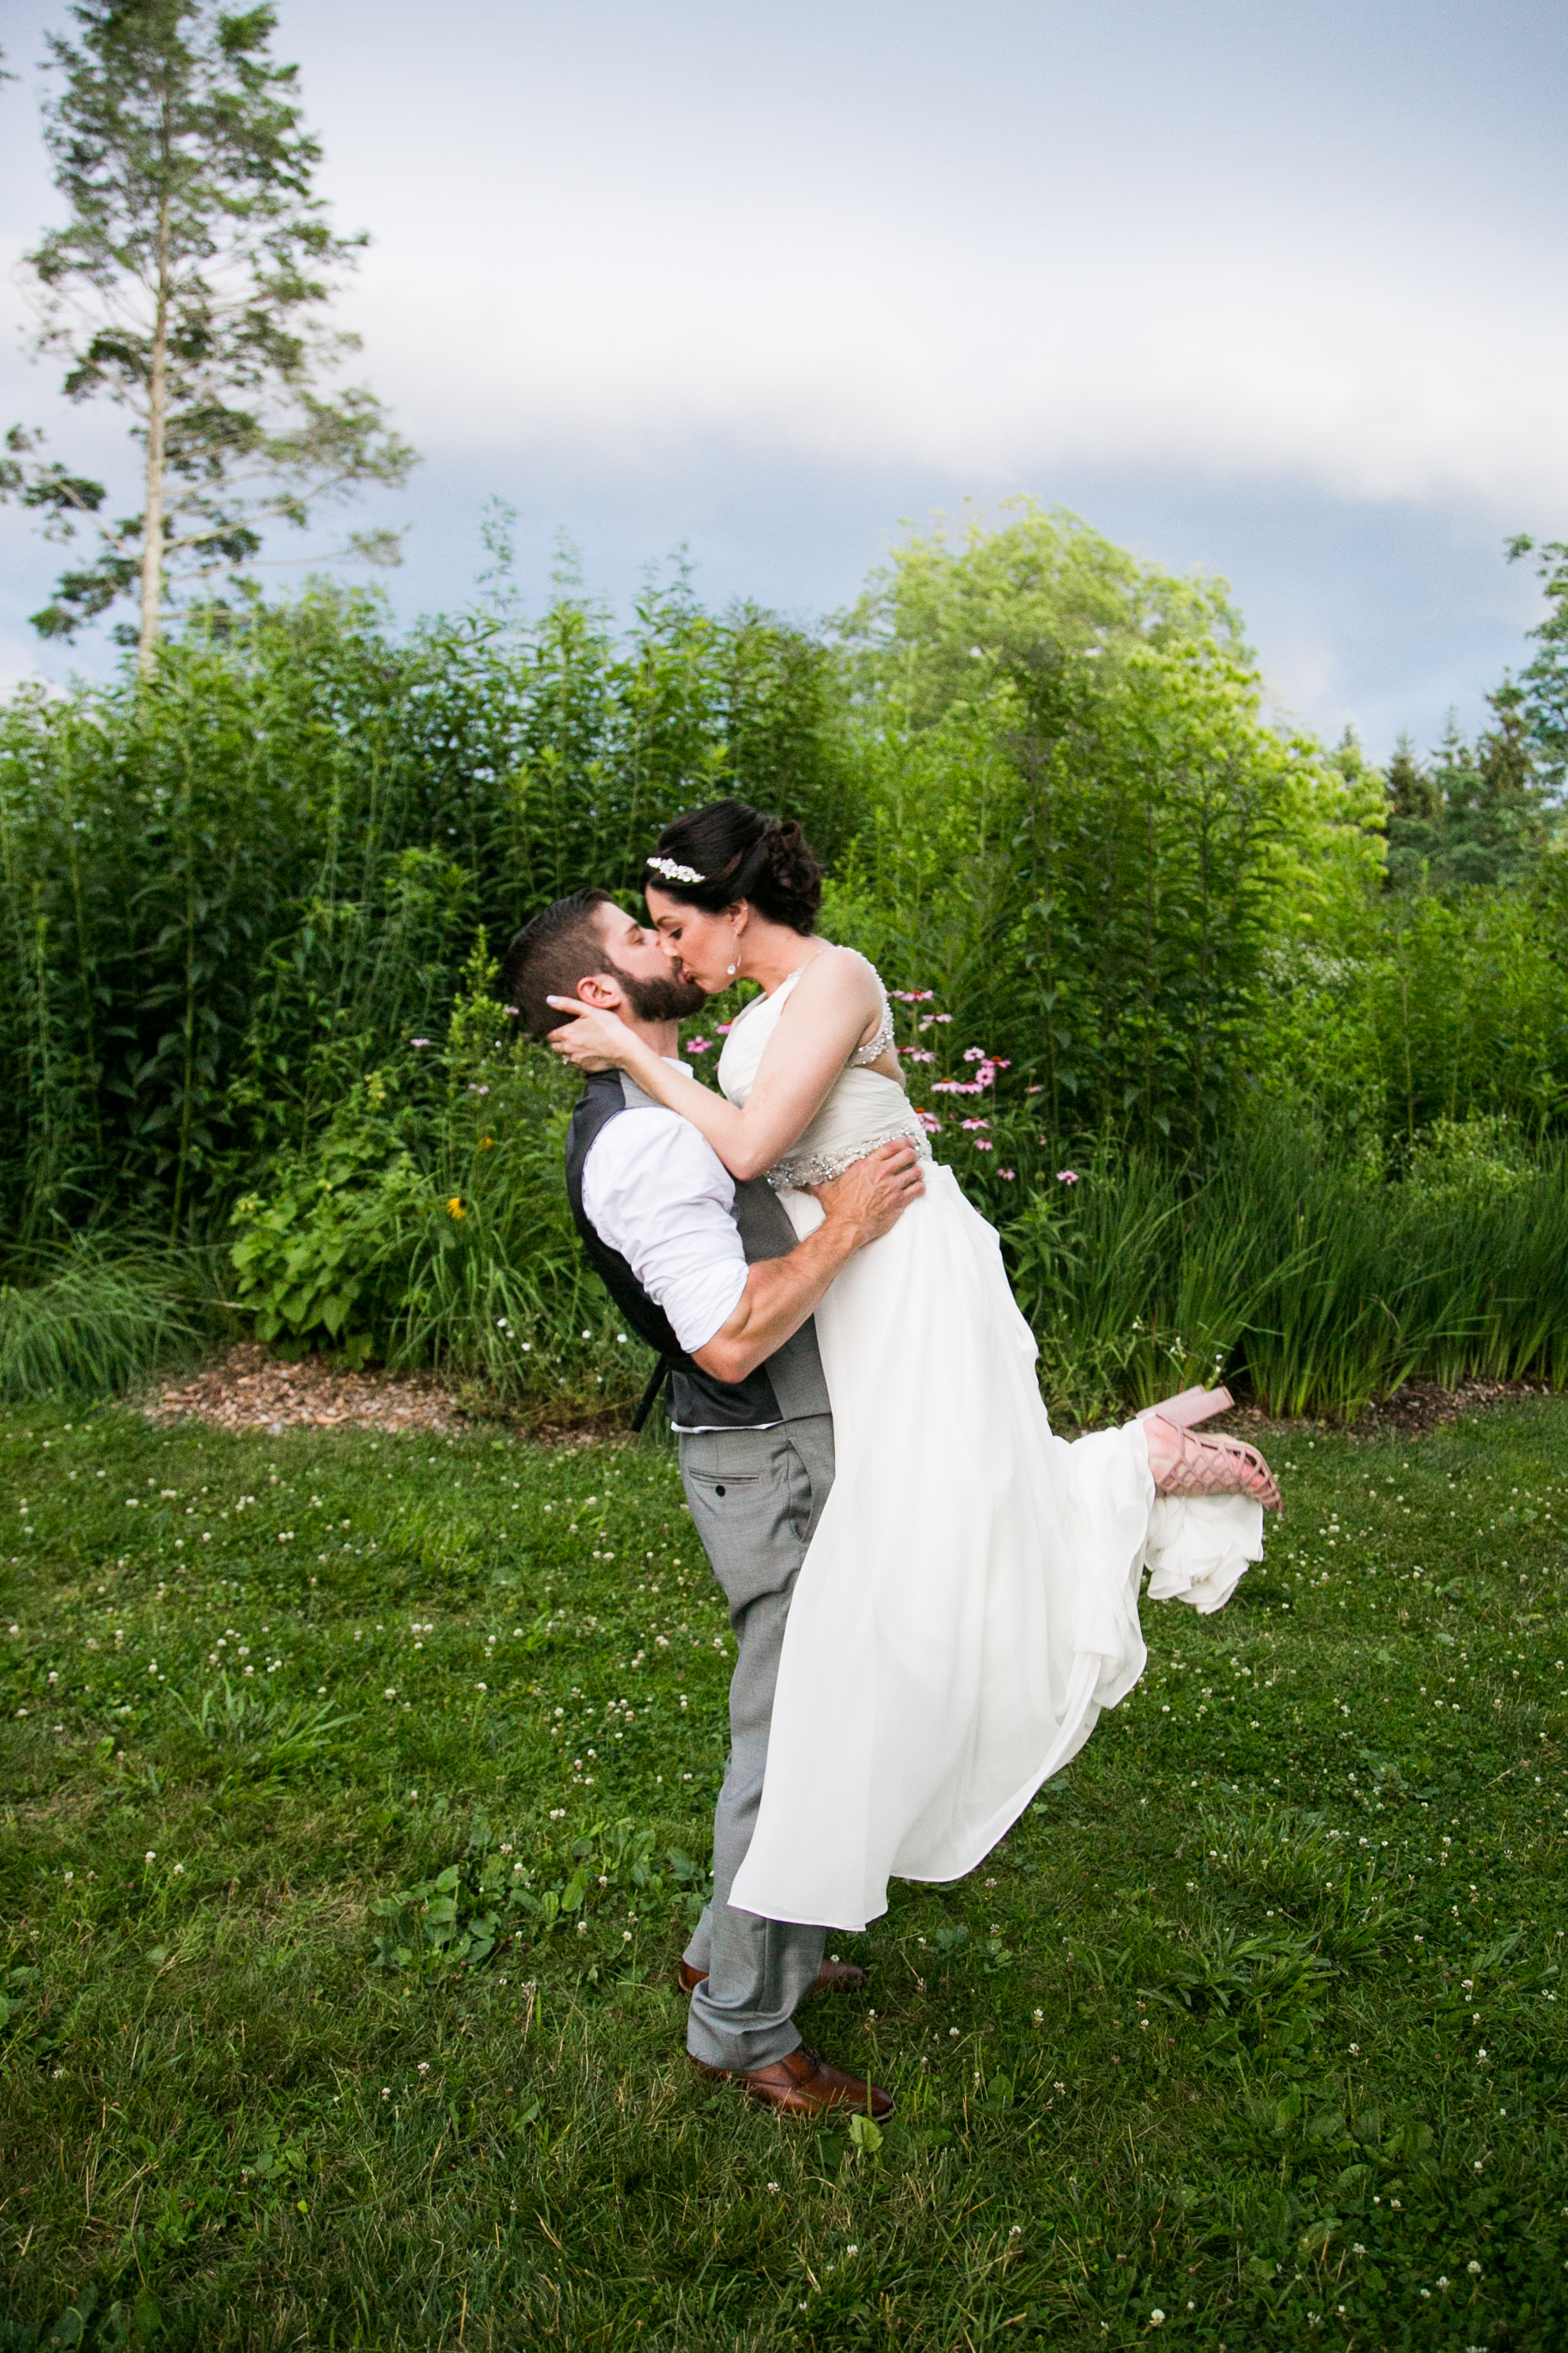 TYLER ARBORETUM WEDDING PHOTOGRAPHY LOVESTRUCK PICTURES-075.jpg